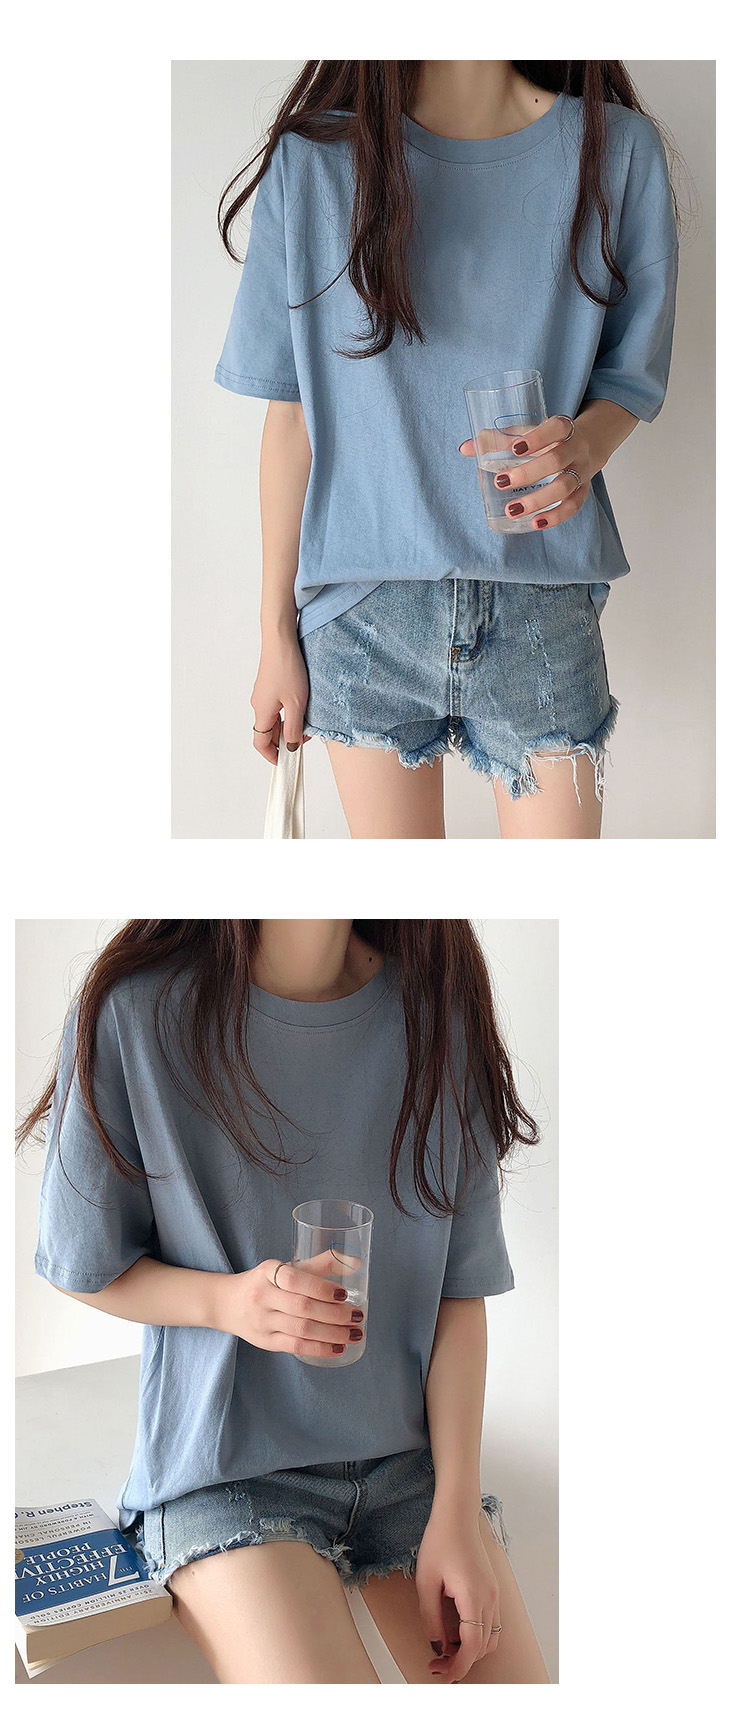 H73c055a89e7641c39681b84cc483fa3cY - Summer O-Neck Short Sleeves Minimalist Loose Basic T-Shirt